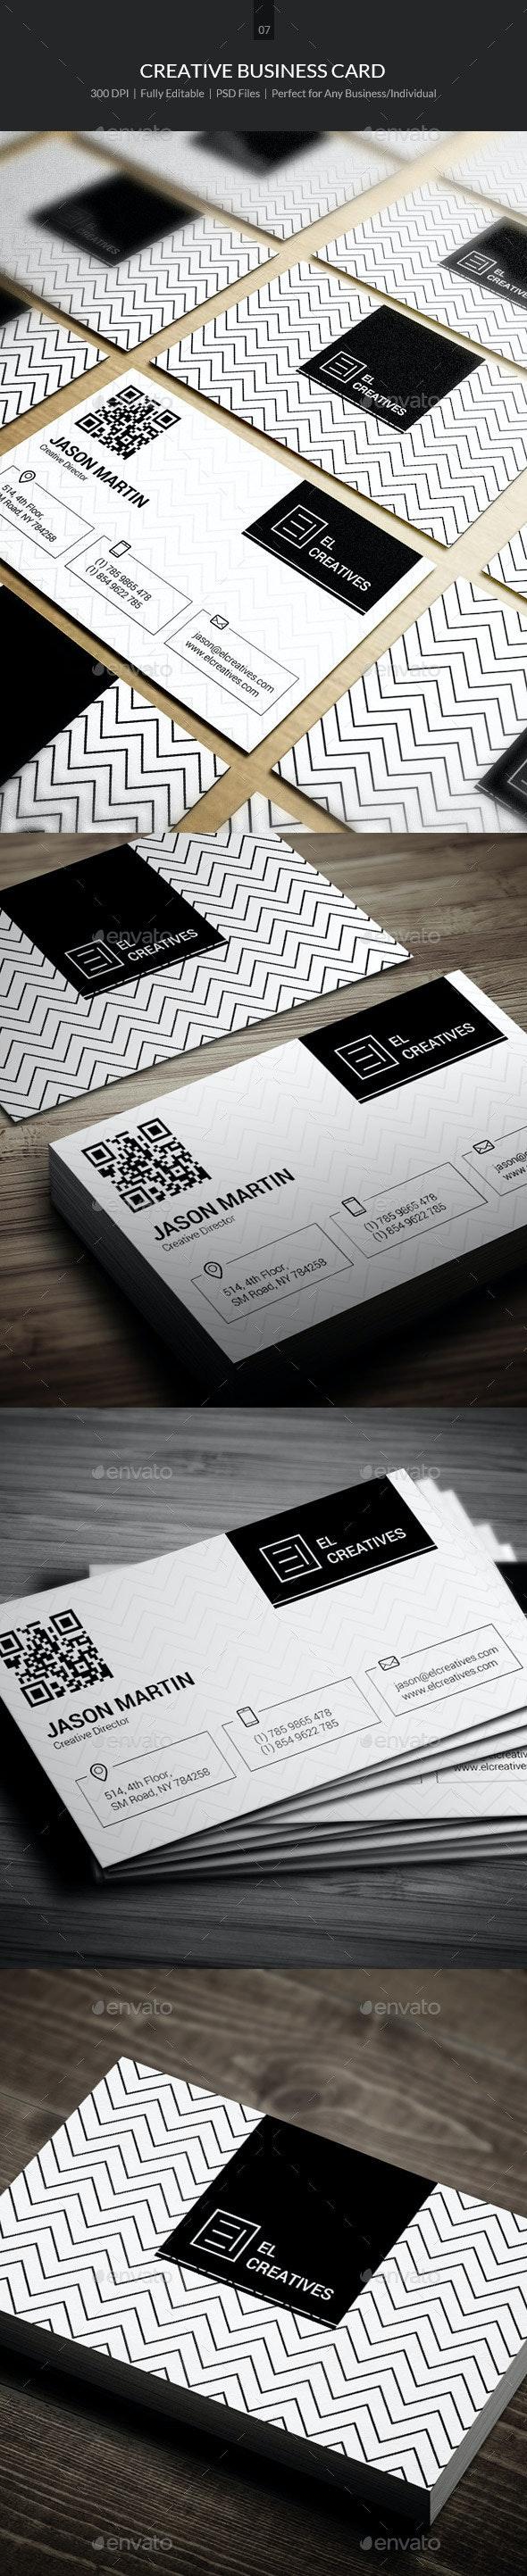 Creative Business Card - 07 - Creative Business Cards